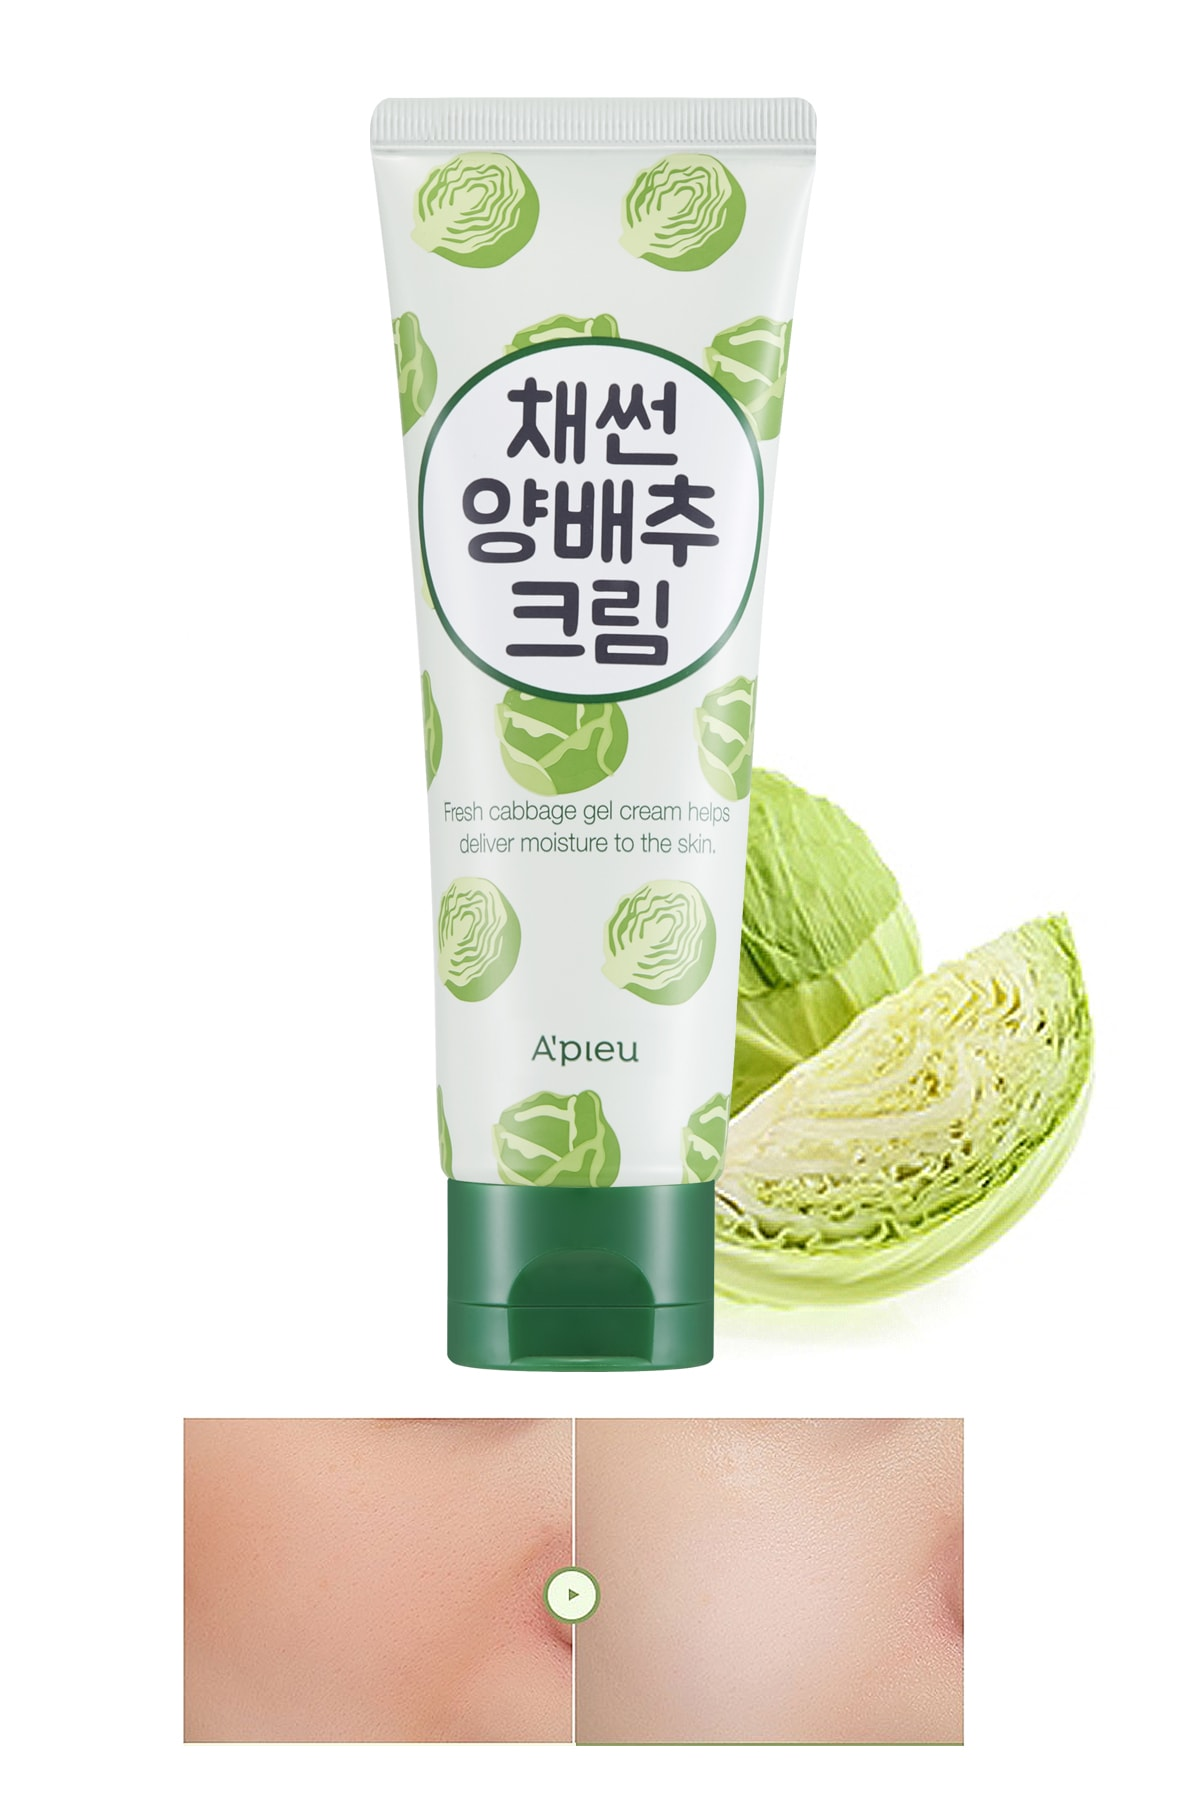 Stres Karşıtı Lahana İçerikli Jel Krem 80g APIEU Shredded Cabbage Cream